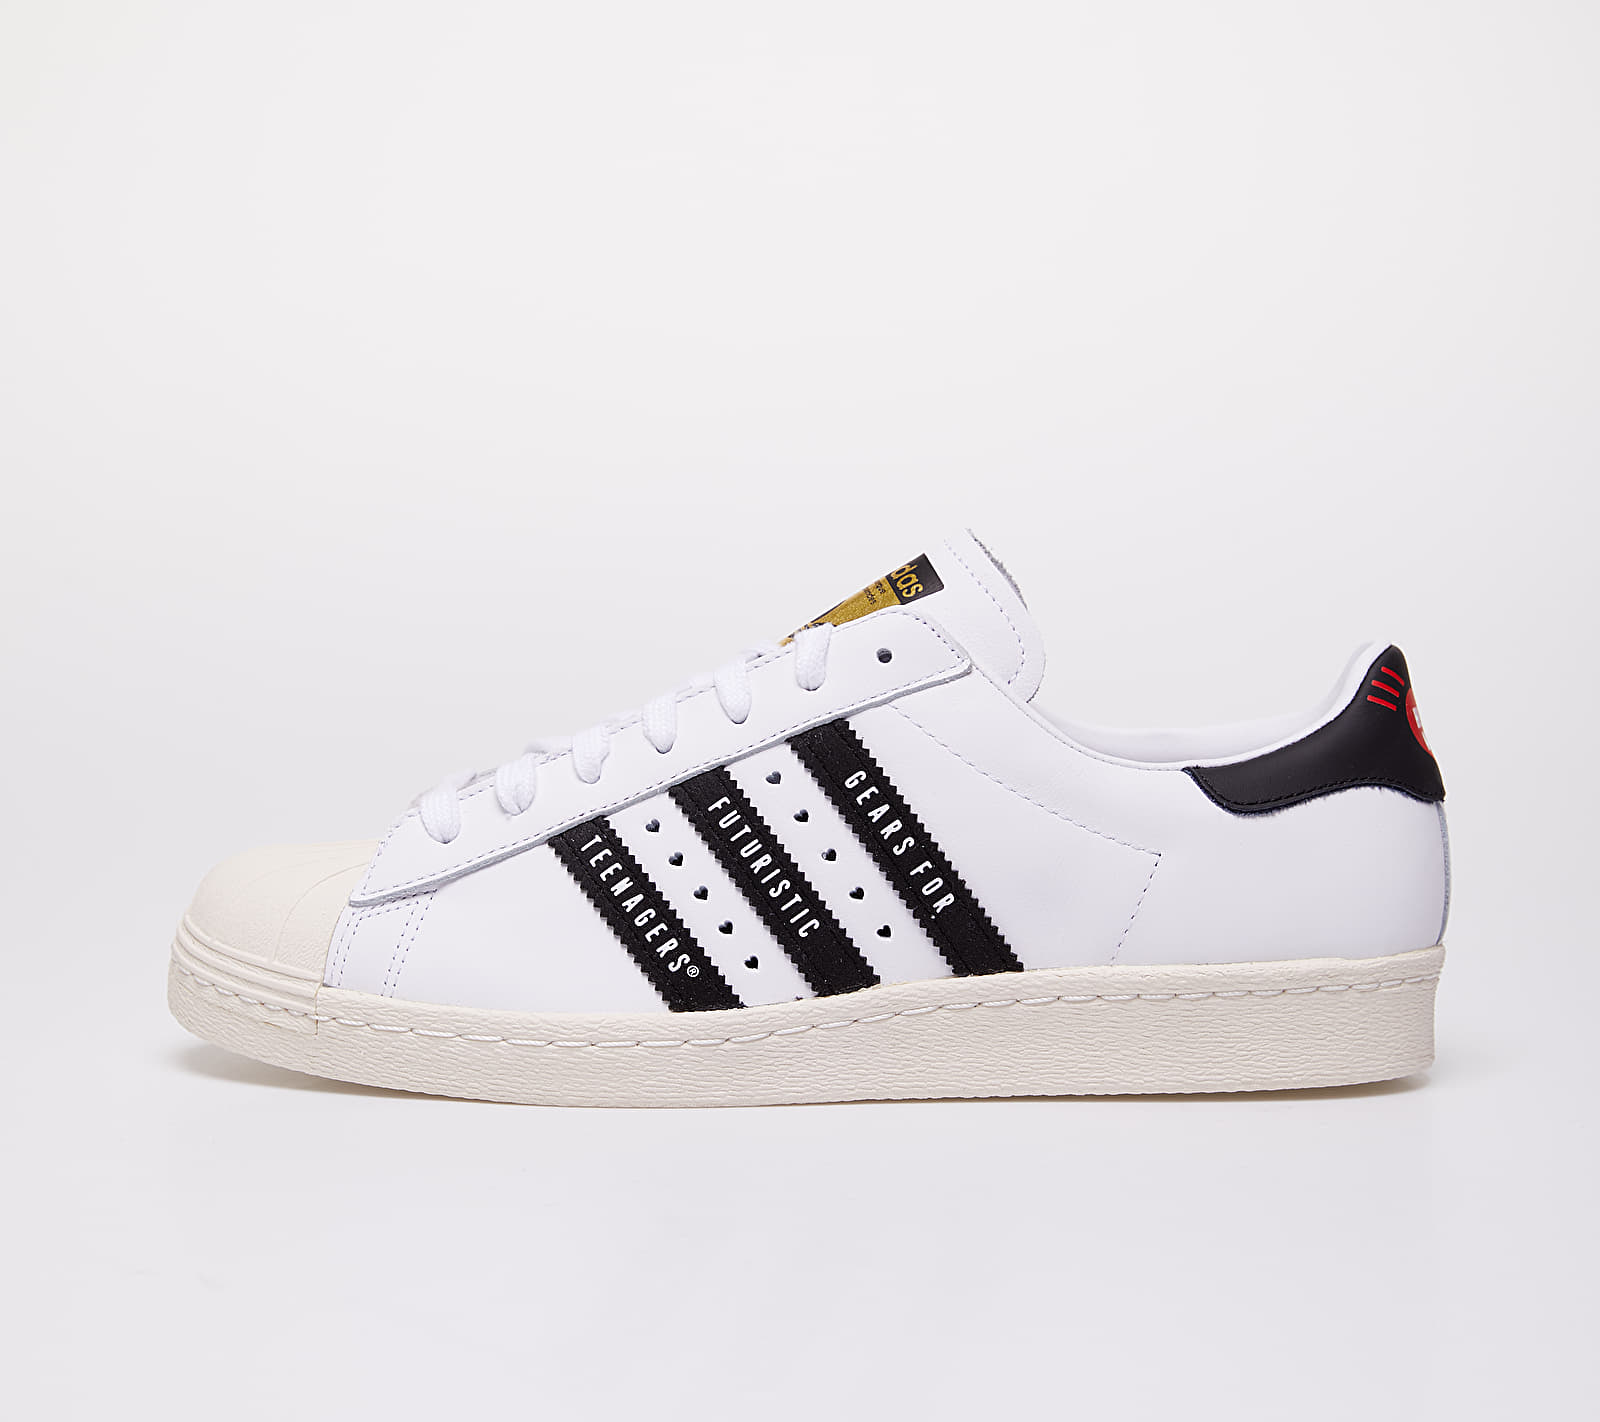 adidas x Pharrell Williams Superstar 80s Human Made Ftwr White/ Core Black/ Off White EUR 39 1/3